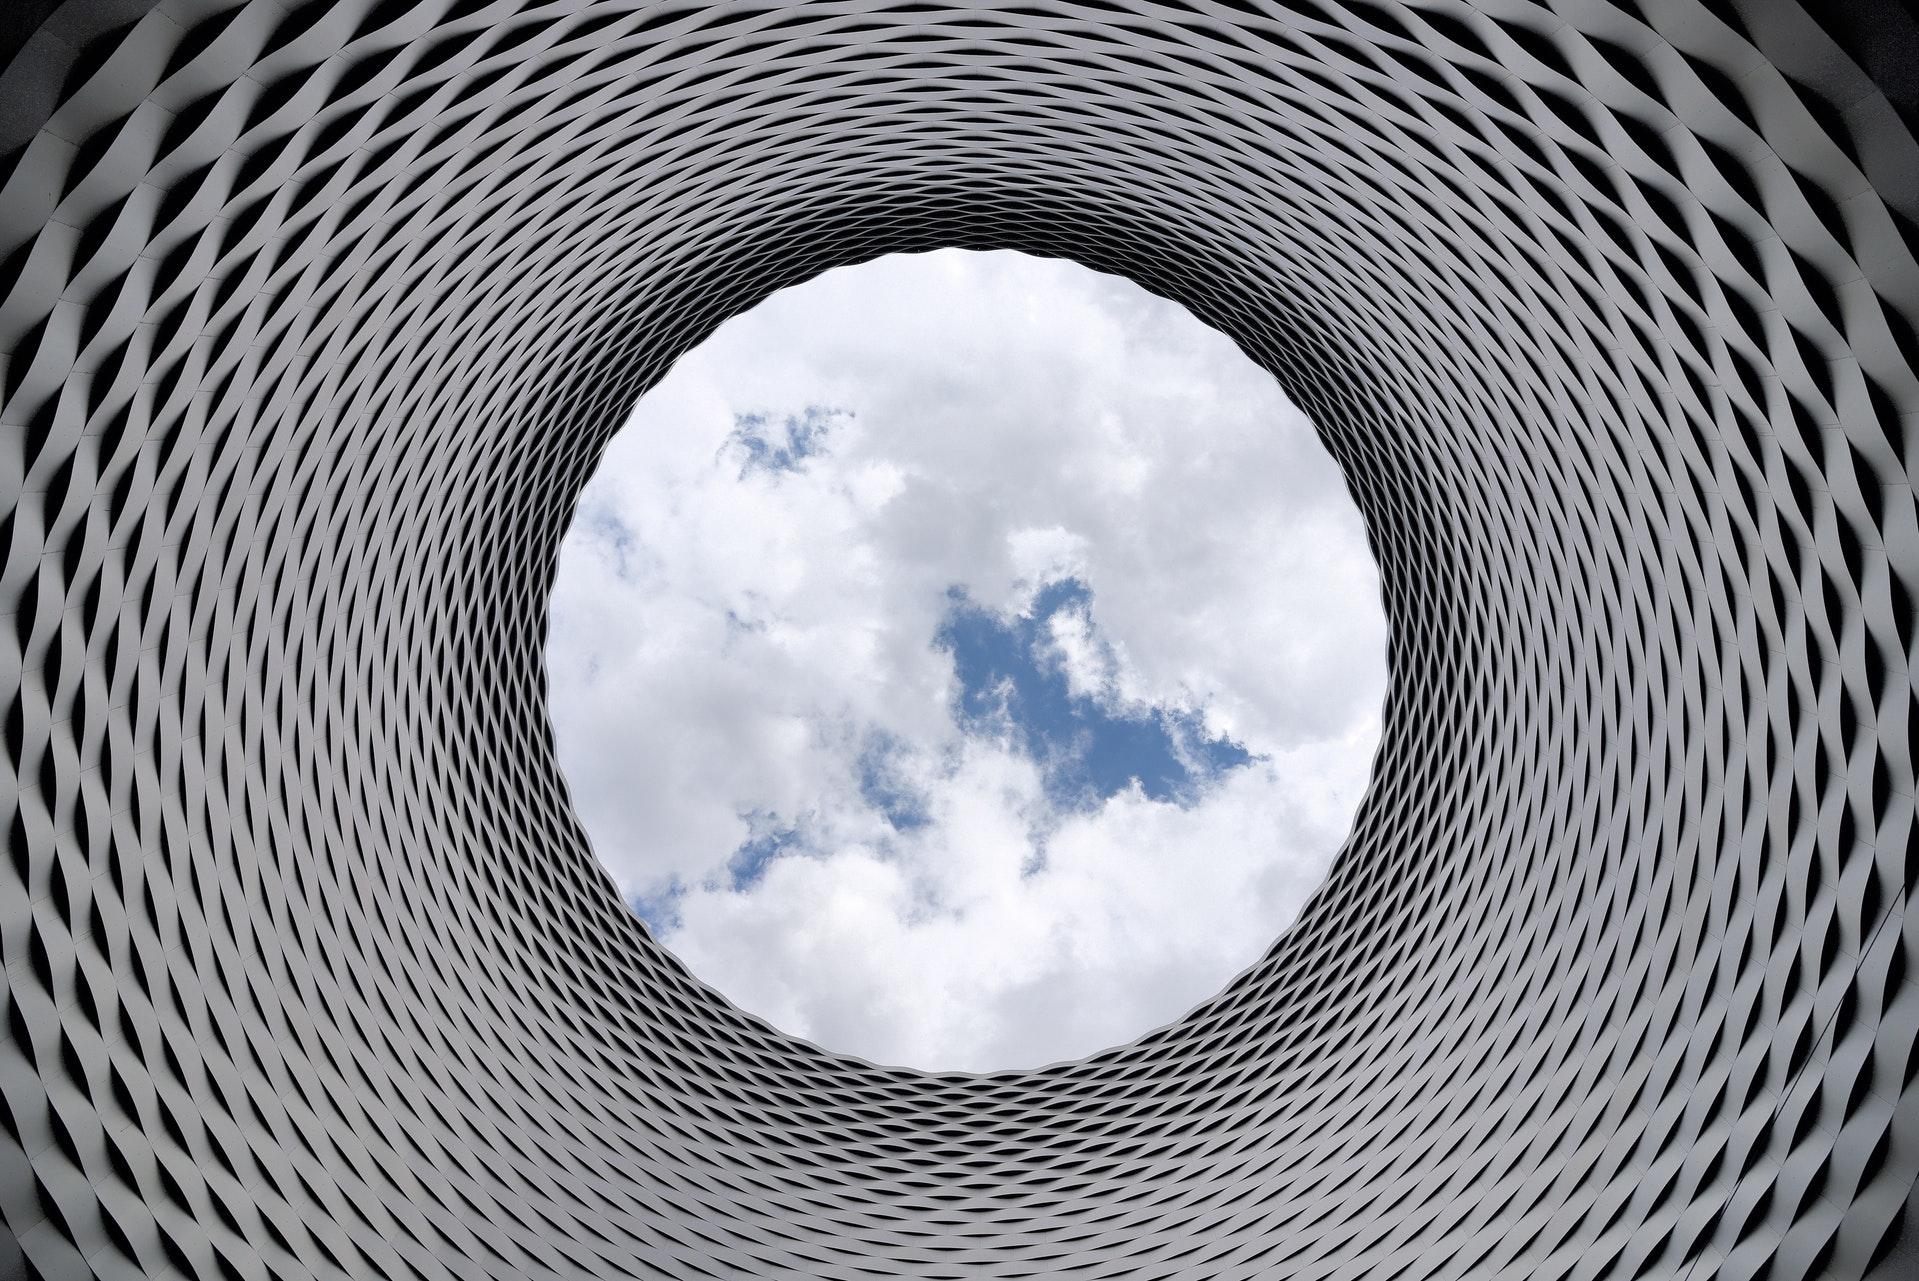 4k-wallpaper-aluminum-architectural-210158-1.jpg